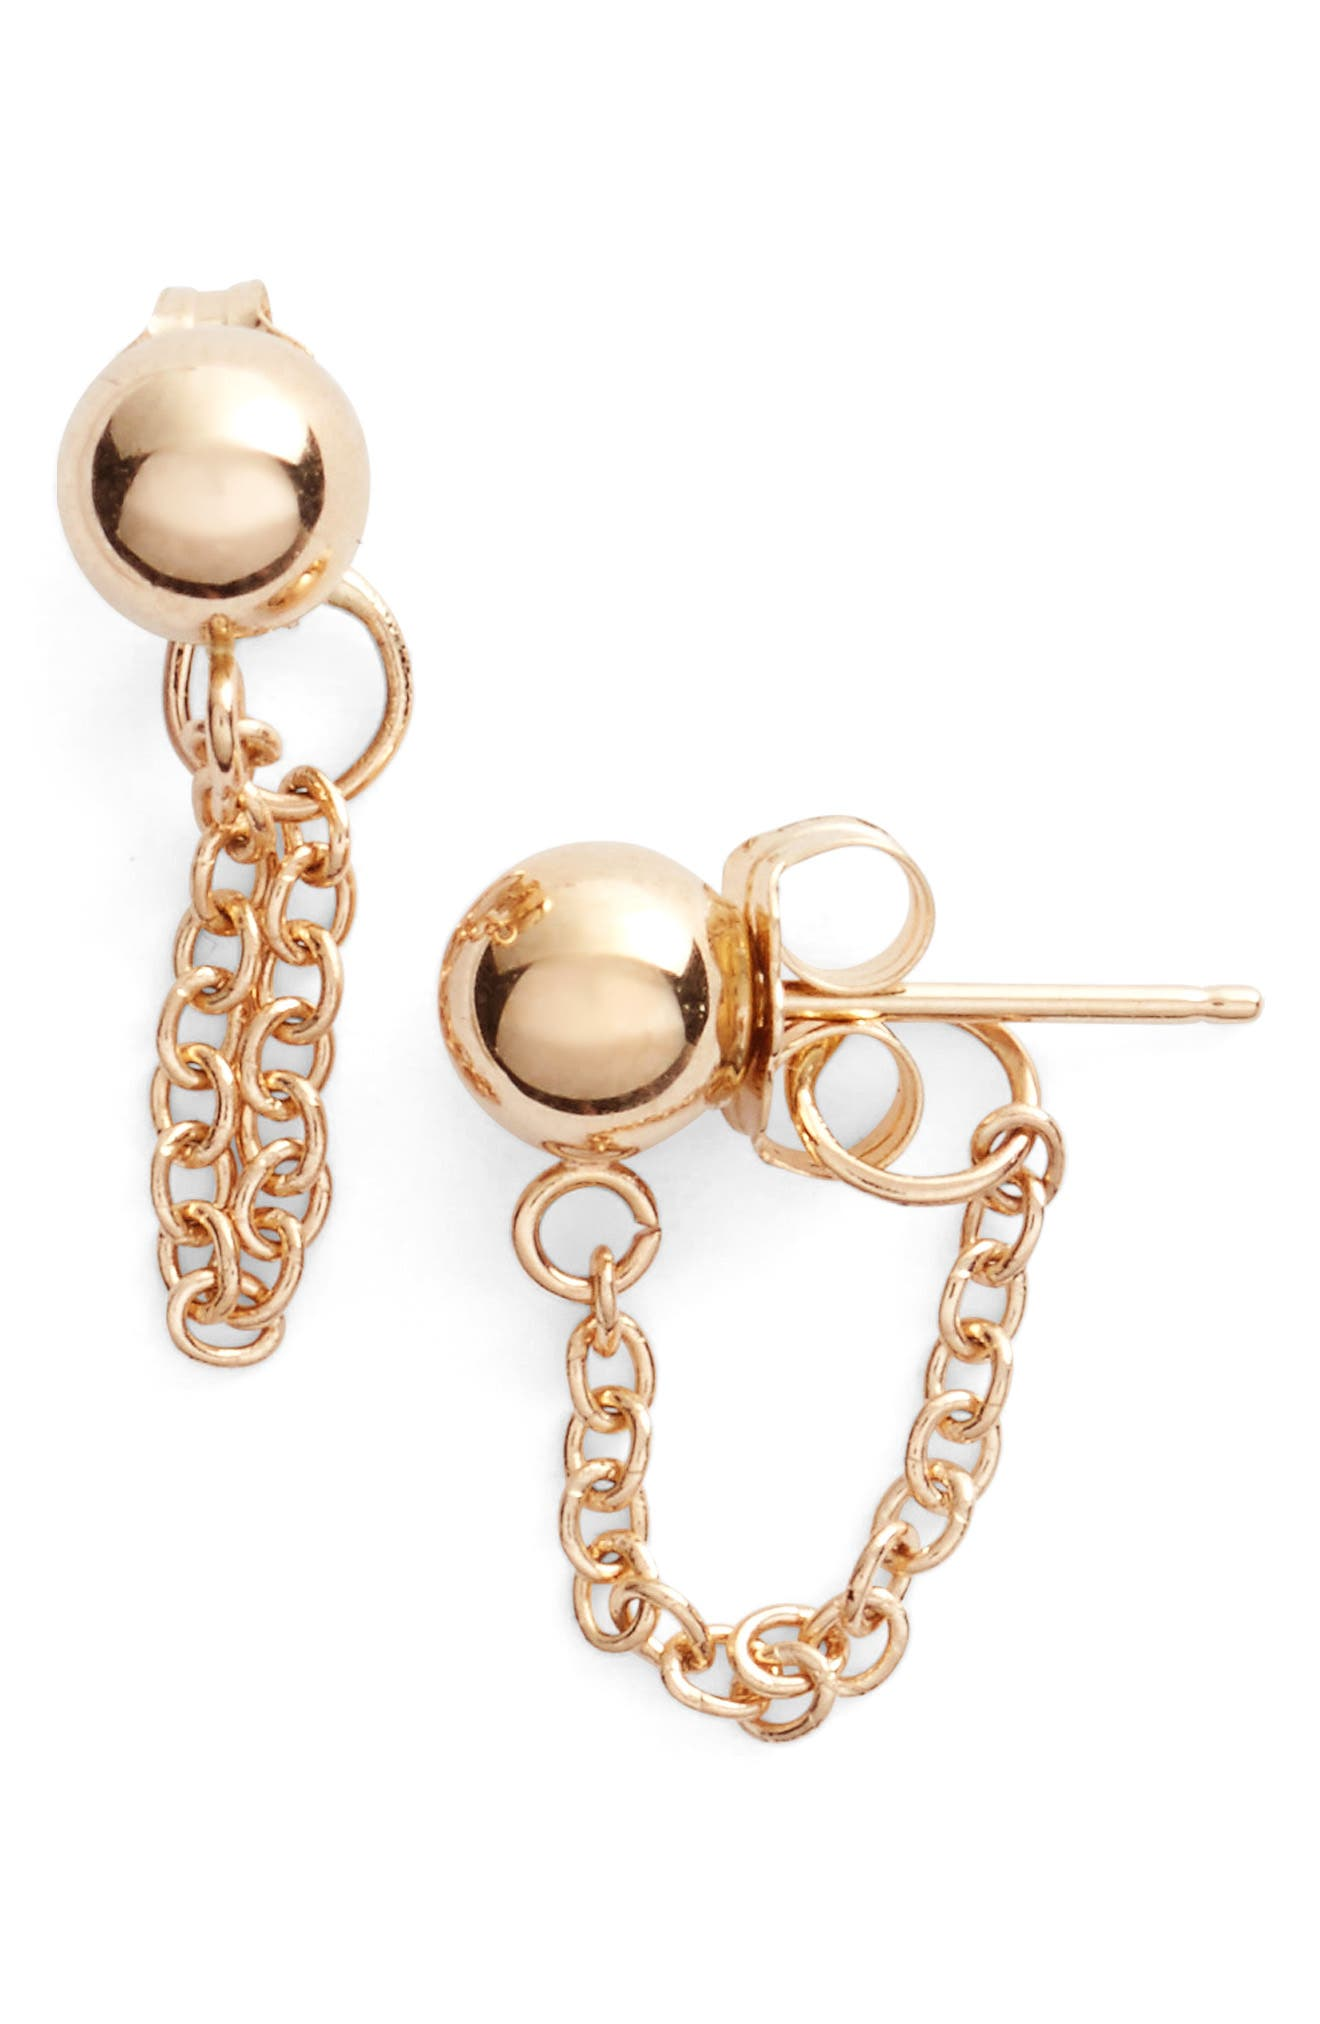 Alternate Image 1 Selected - Poppy Finch Gold Ball Chain Earrings